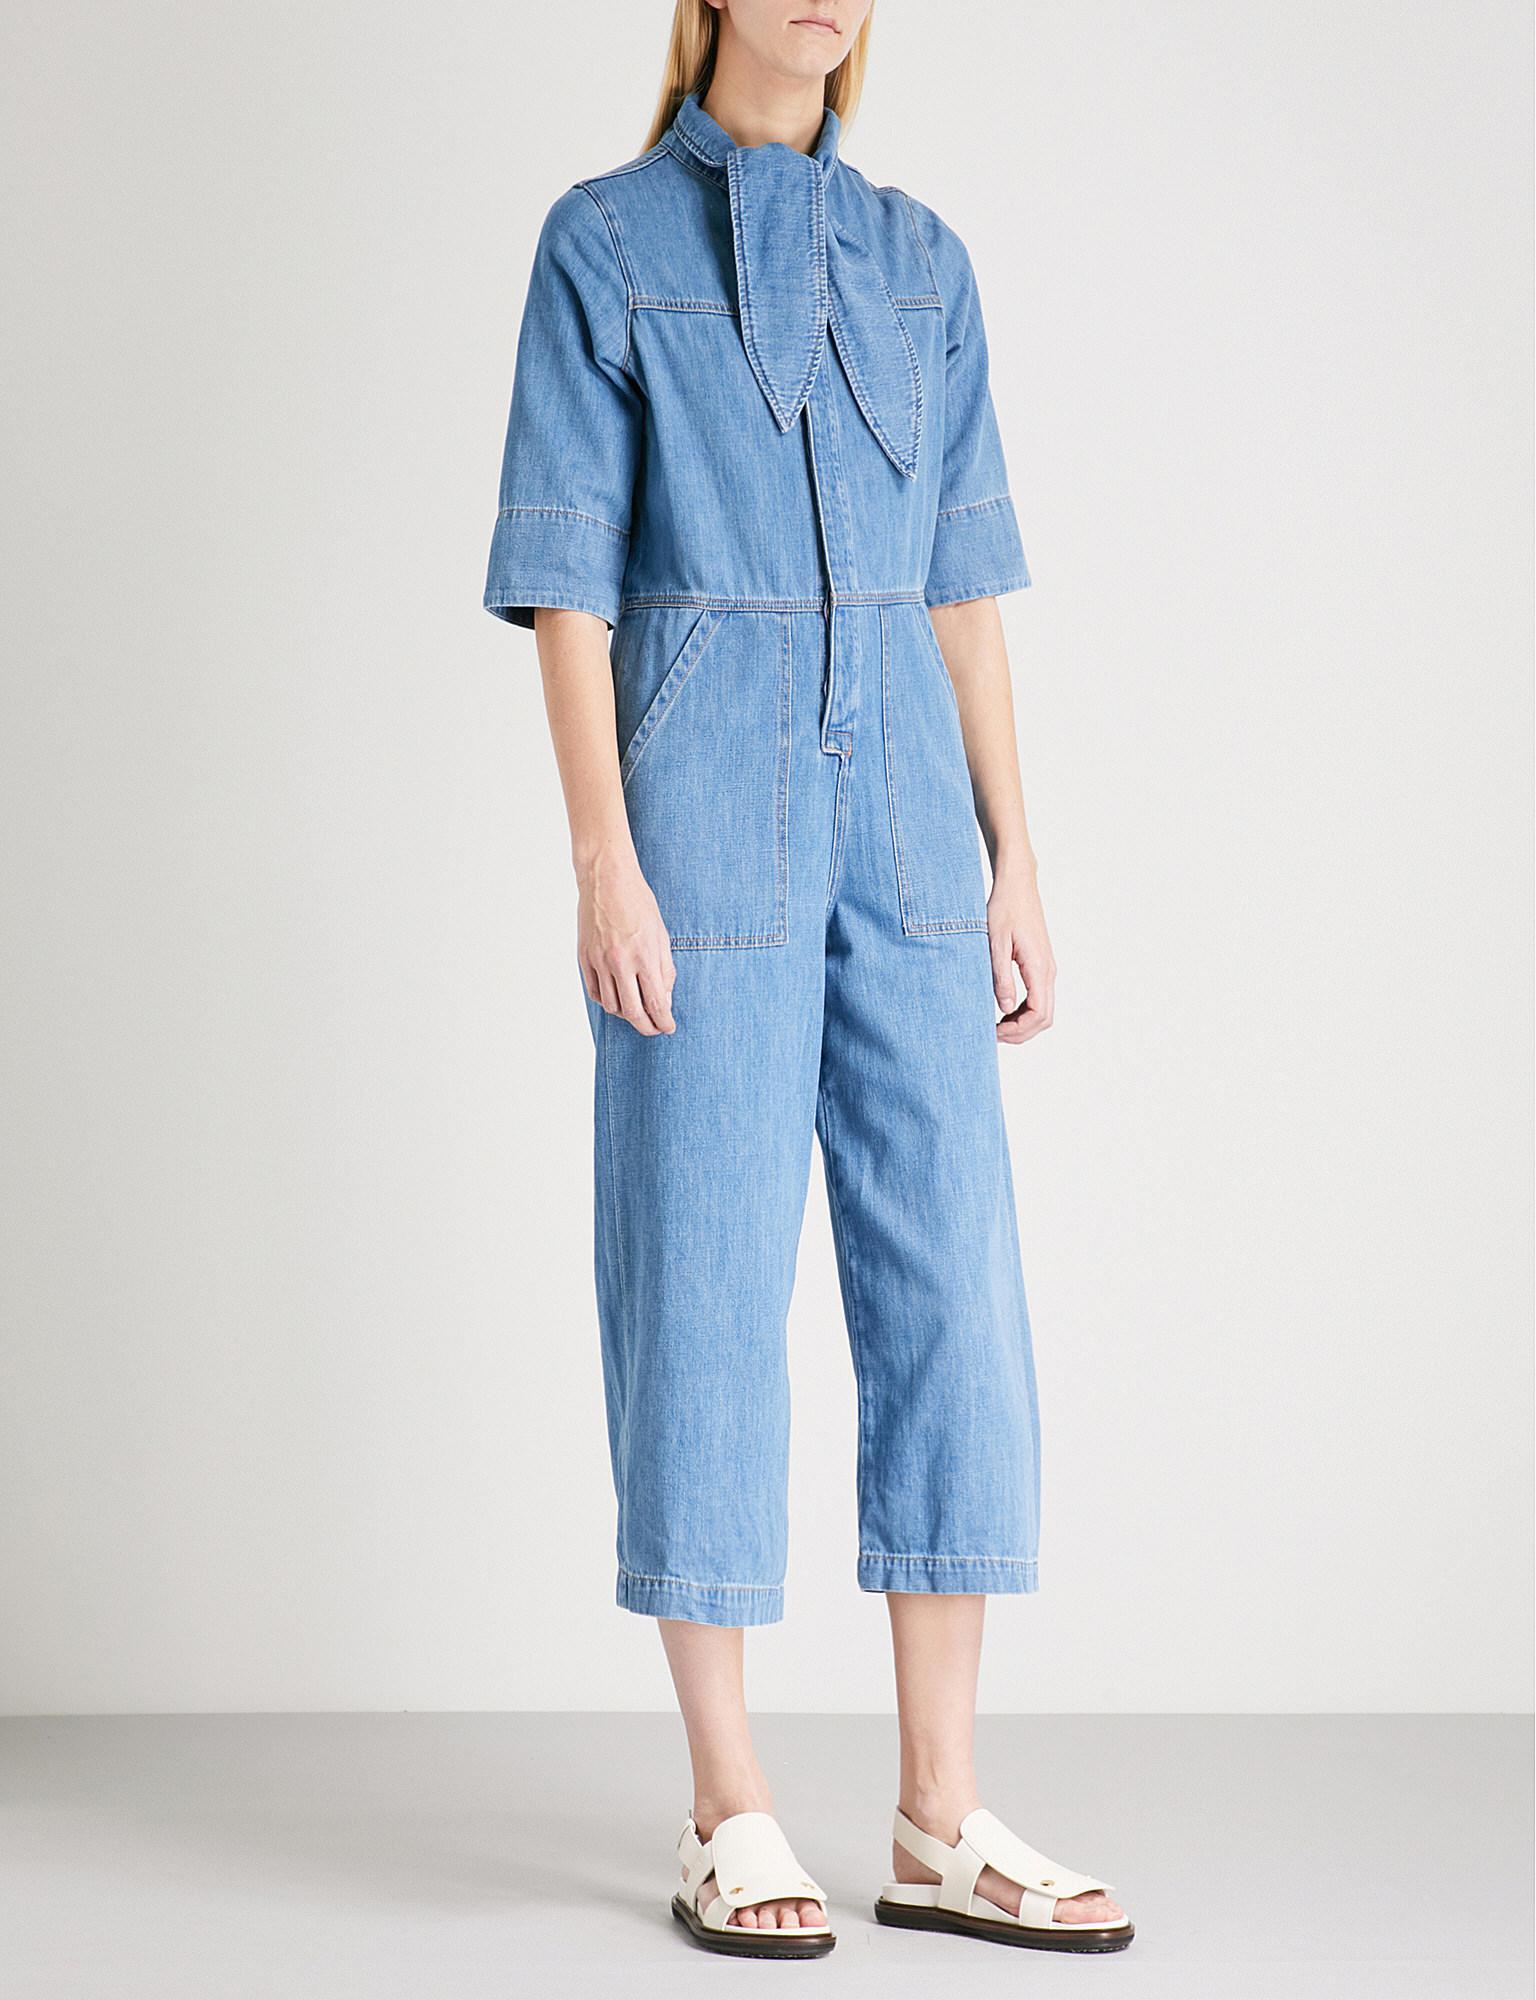 5b8b86f5149 Lyst - M.i.h Jeans Calman Denim Jumpsuit in Blue